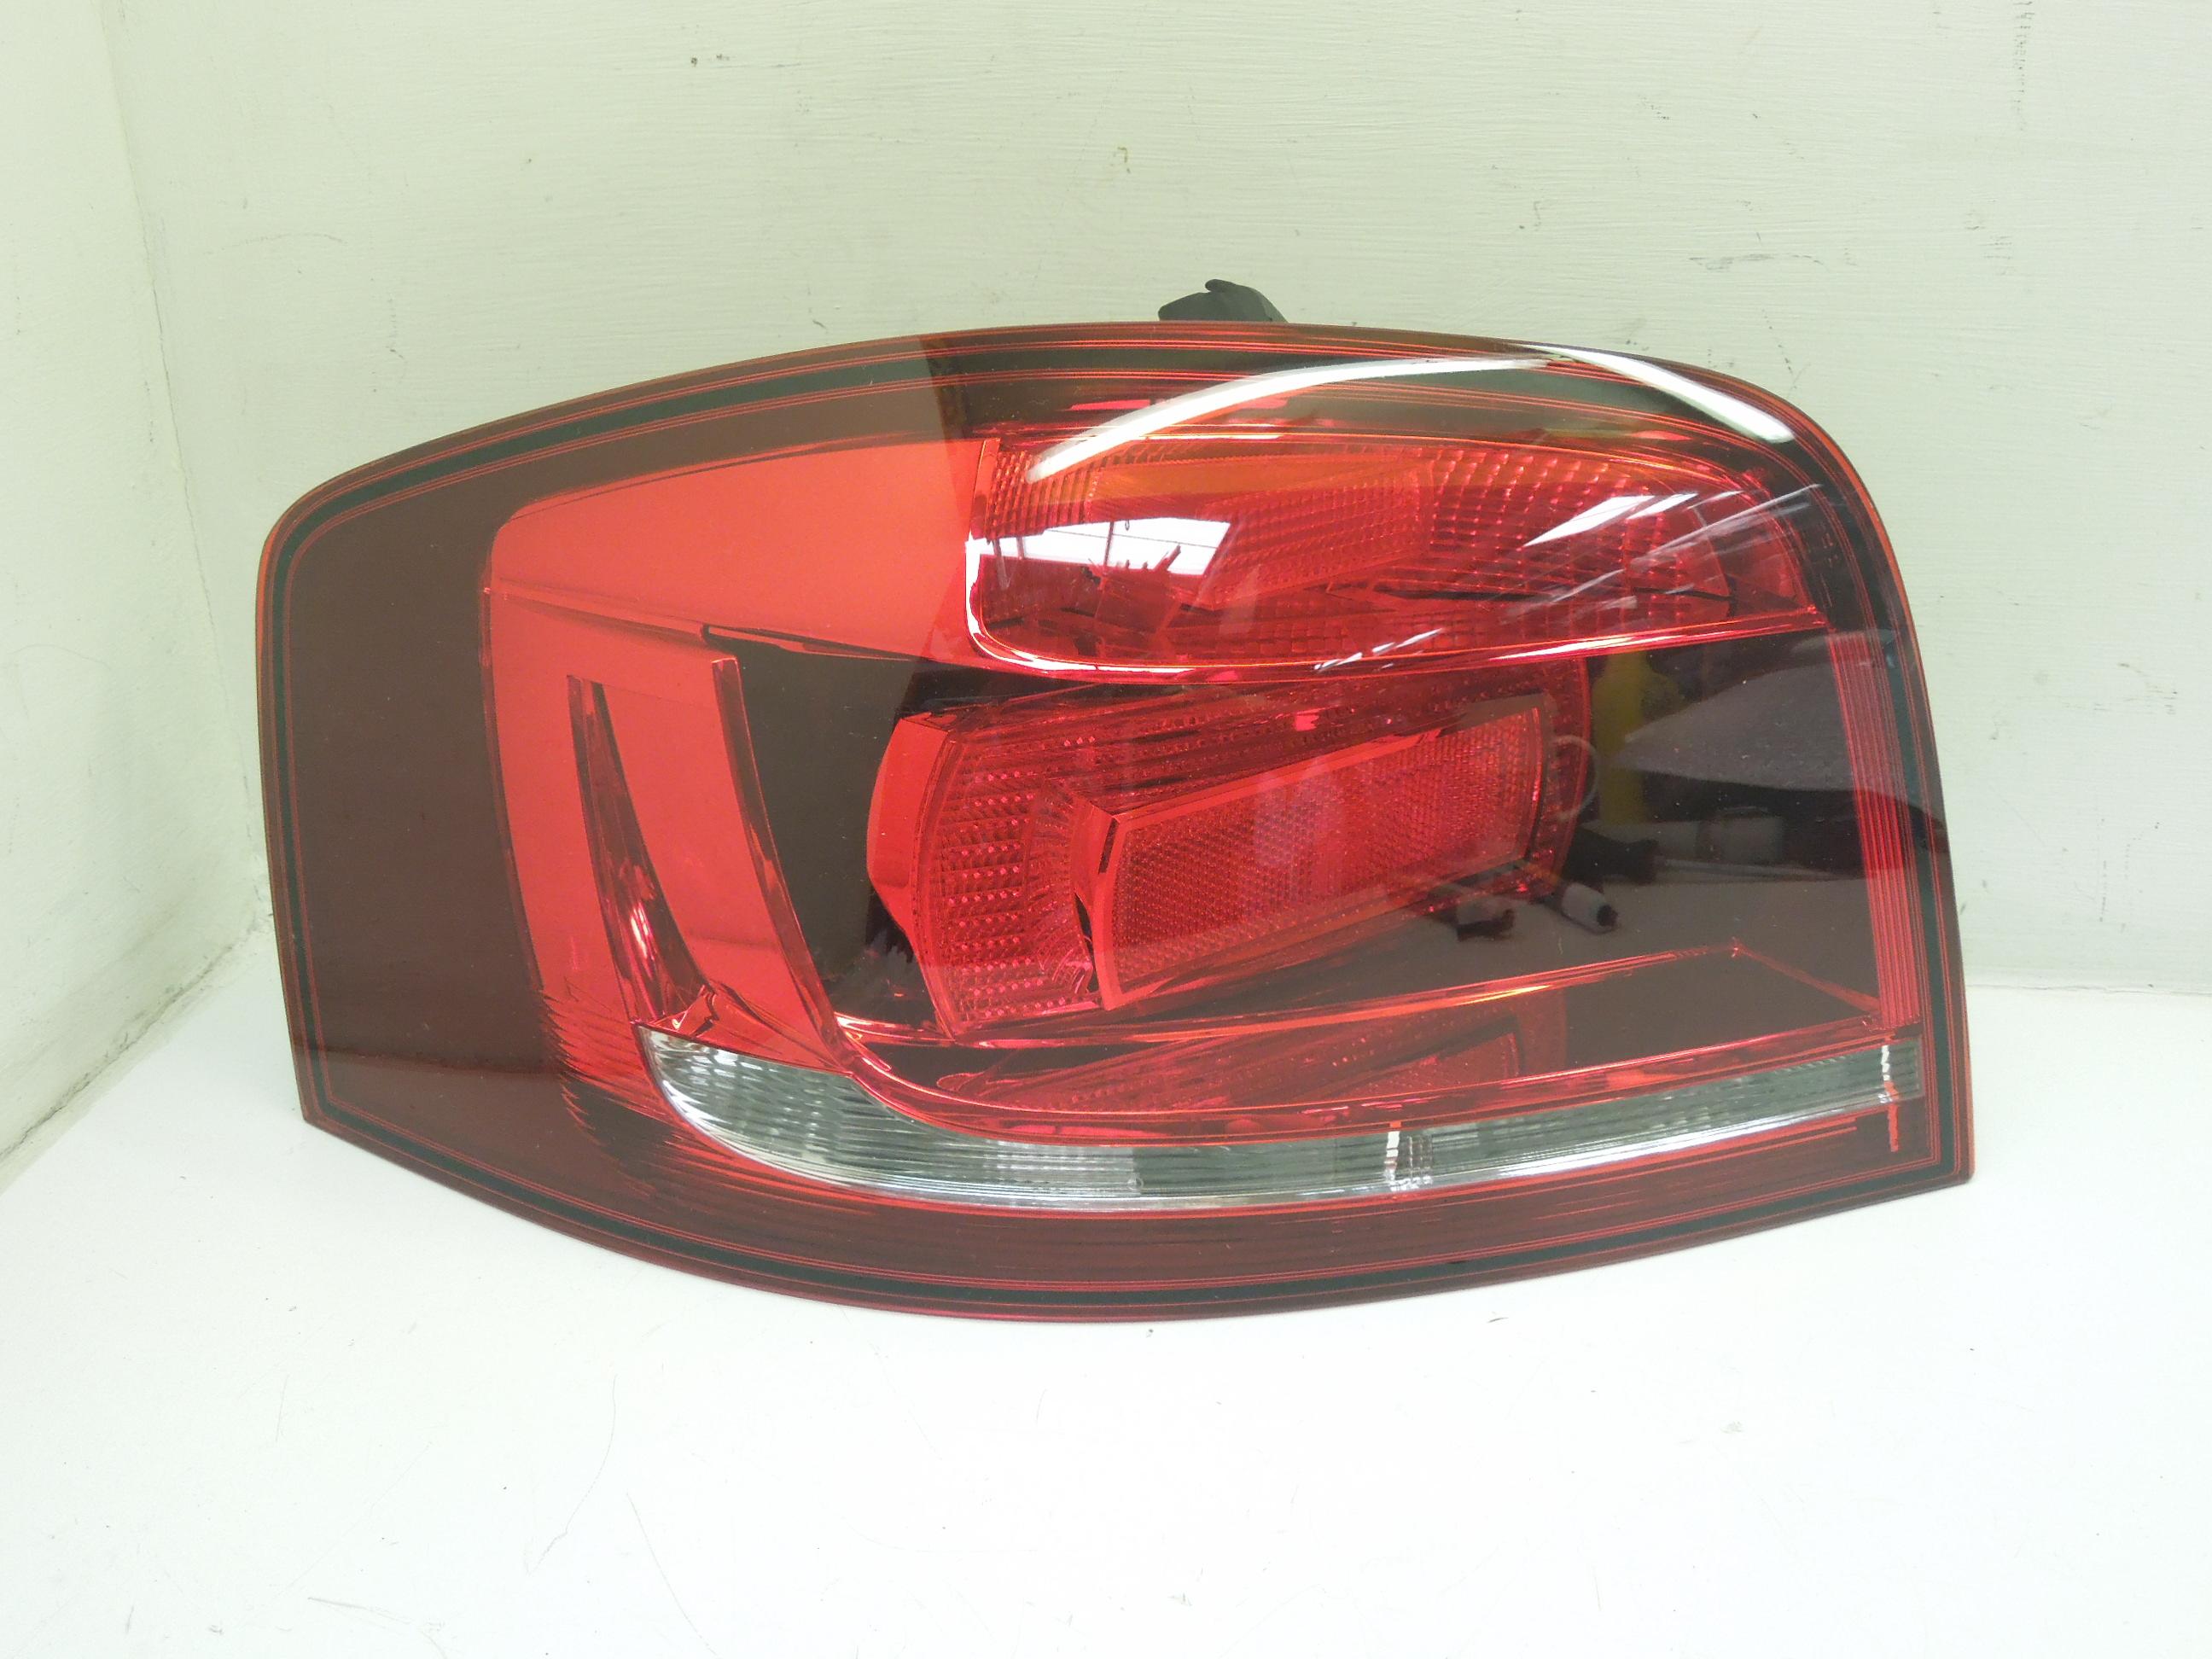 AUDI A3 8P 3 Door Hatchback Facelift 2008-2011 Rear Tail Light Lamp LEFT